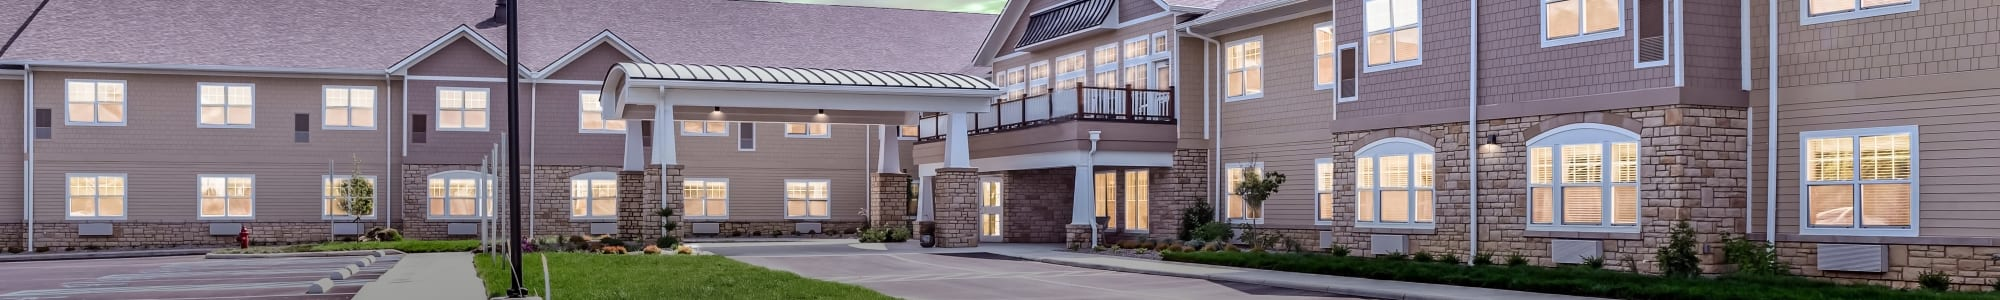 Contact Trilogy Health Services - La Grange in La Grange, Kentucky